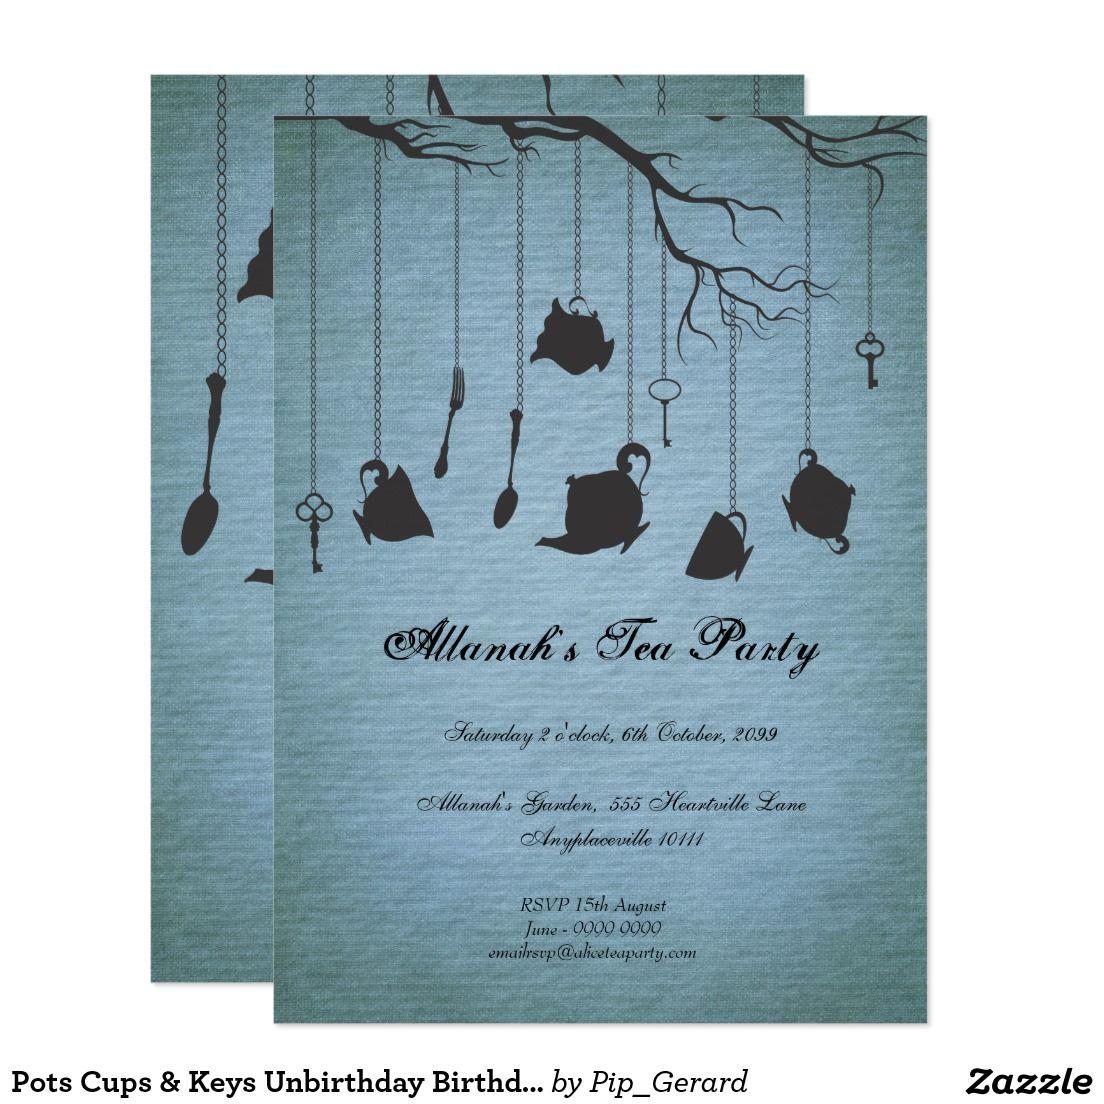 Pots Cups & Keys Unbirthday Birthday Tea Party Card | Tea Party ...